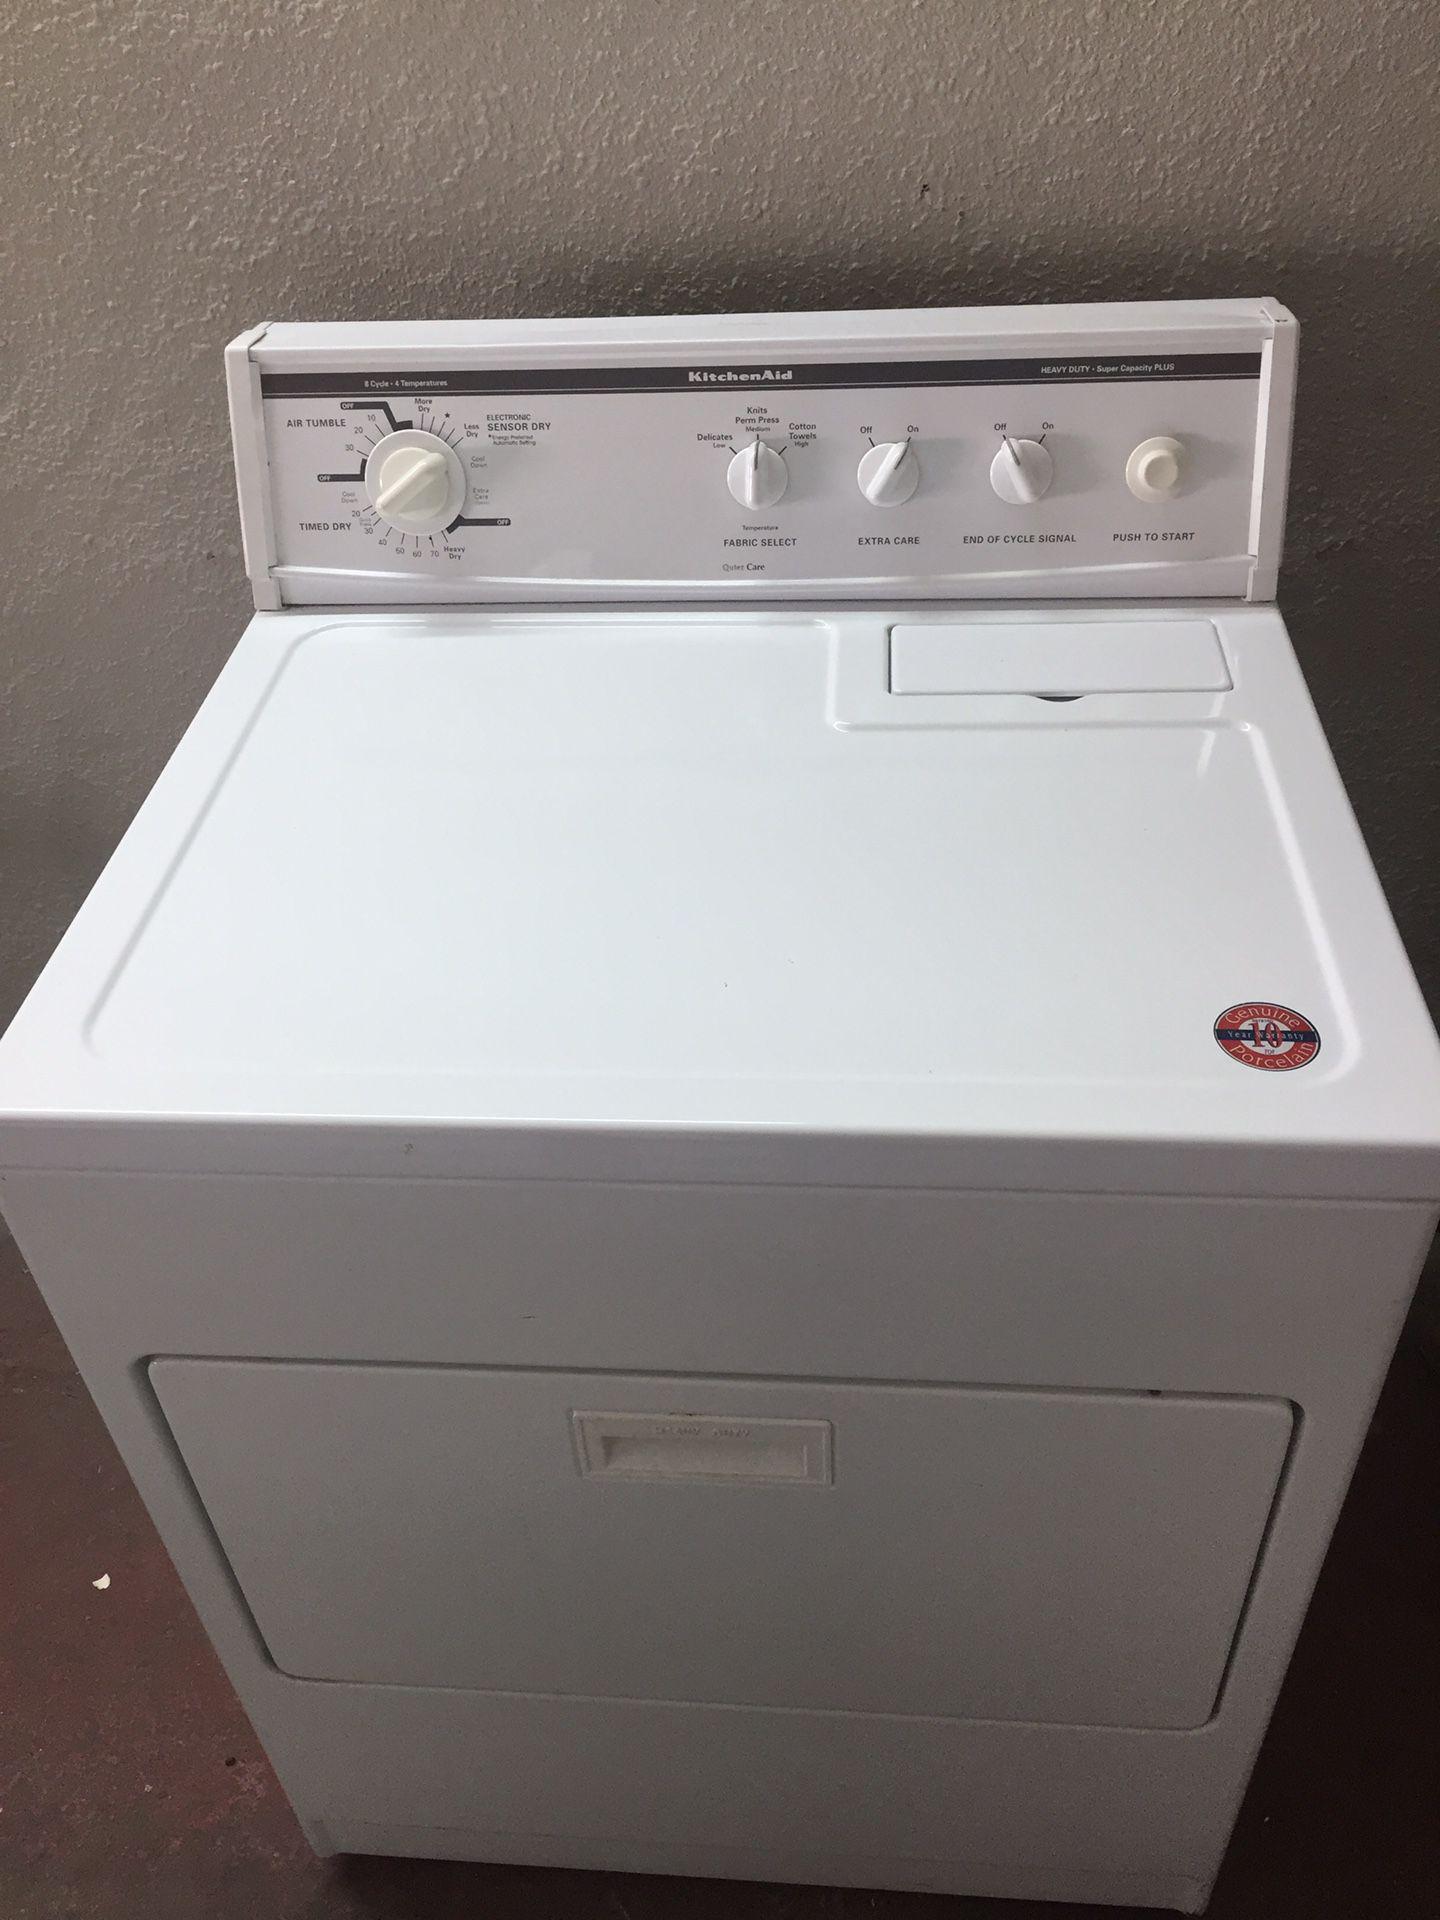 Kitchen Aid Electric Dryer